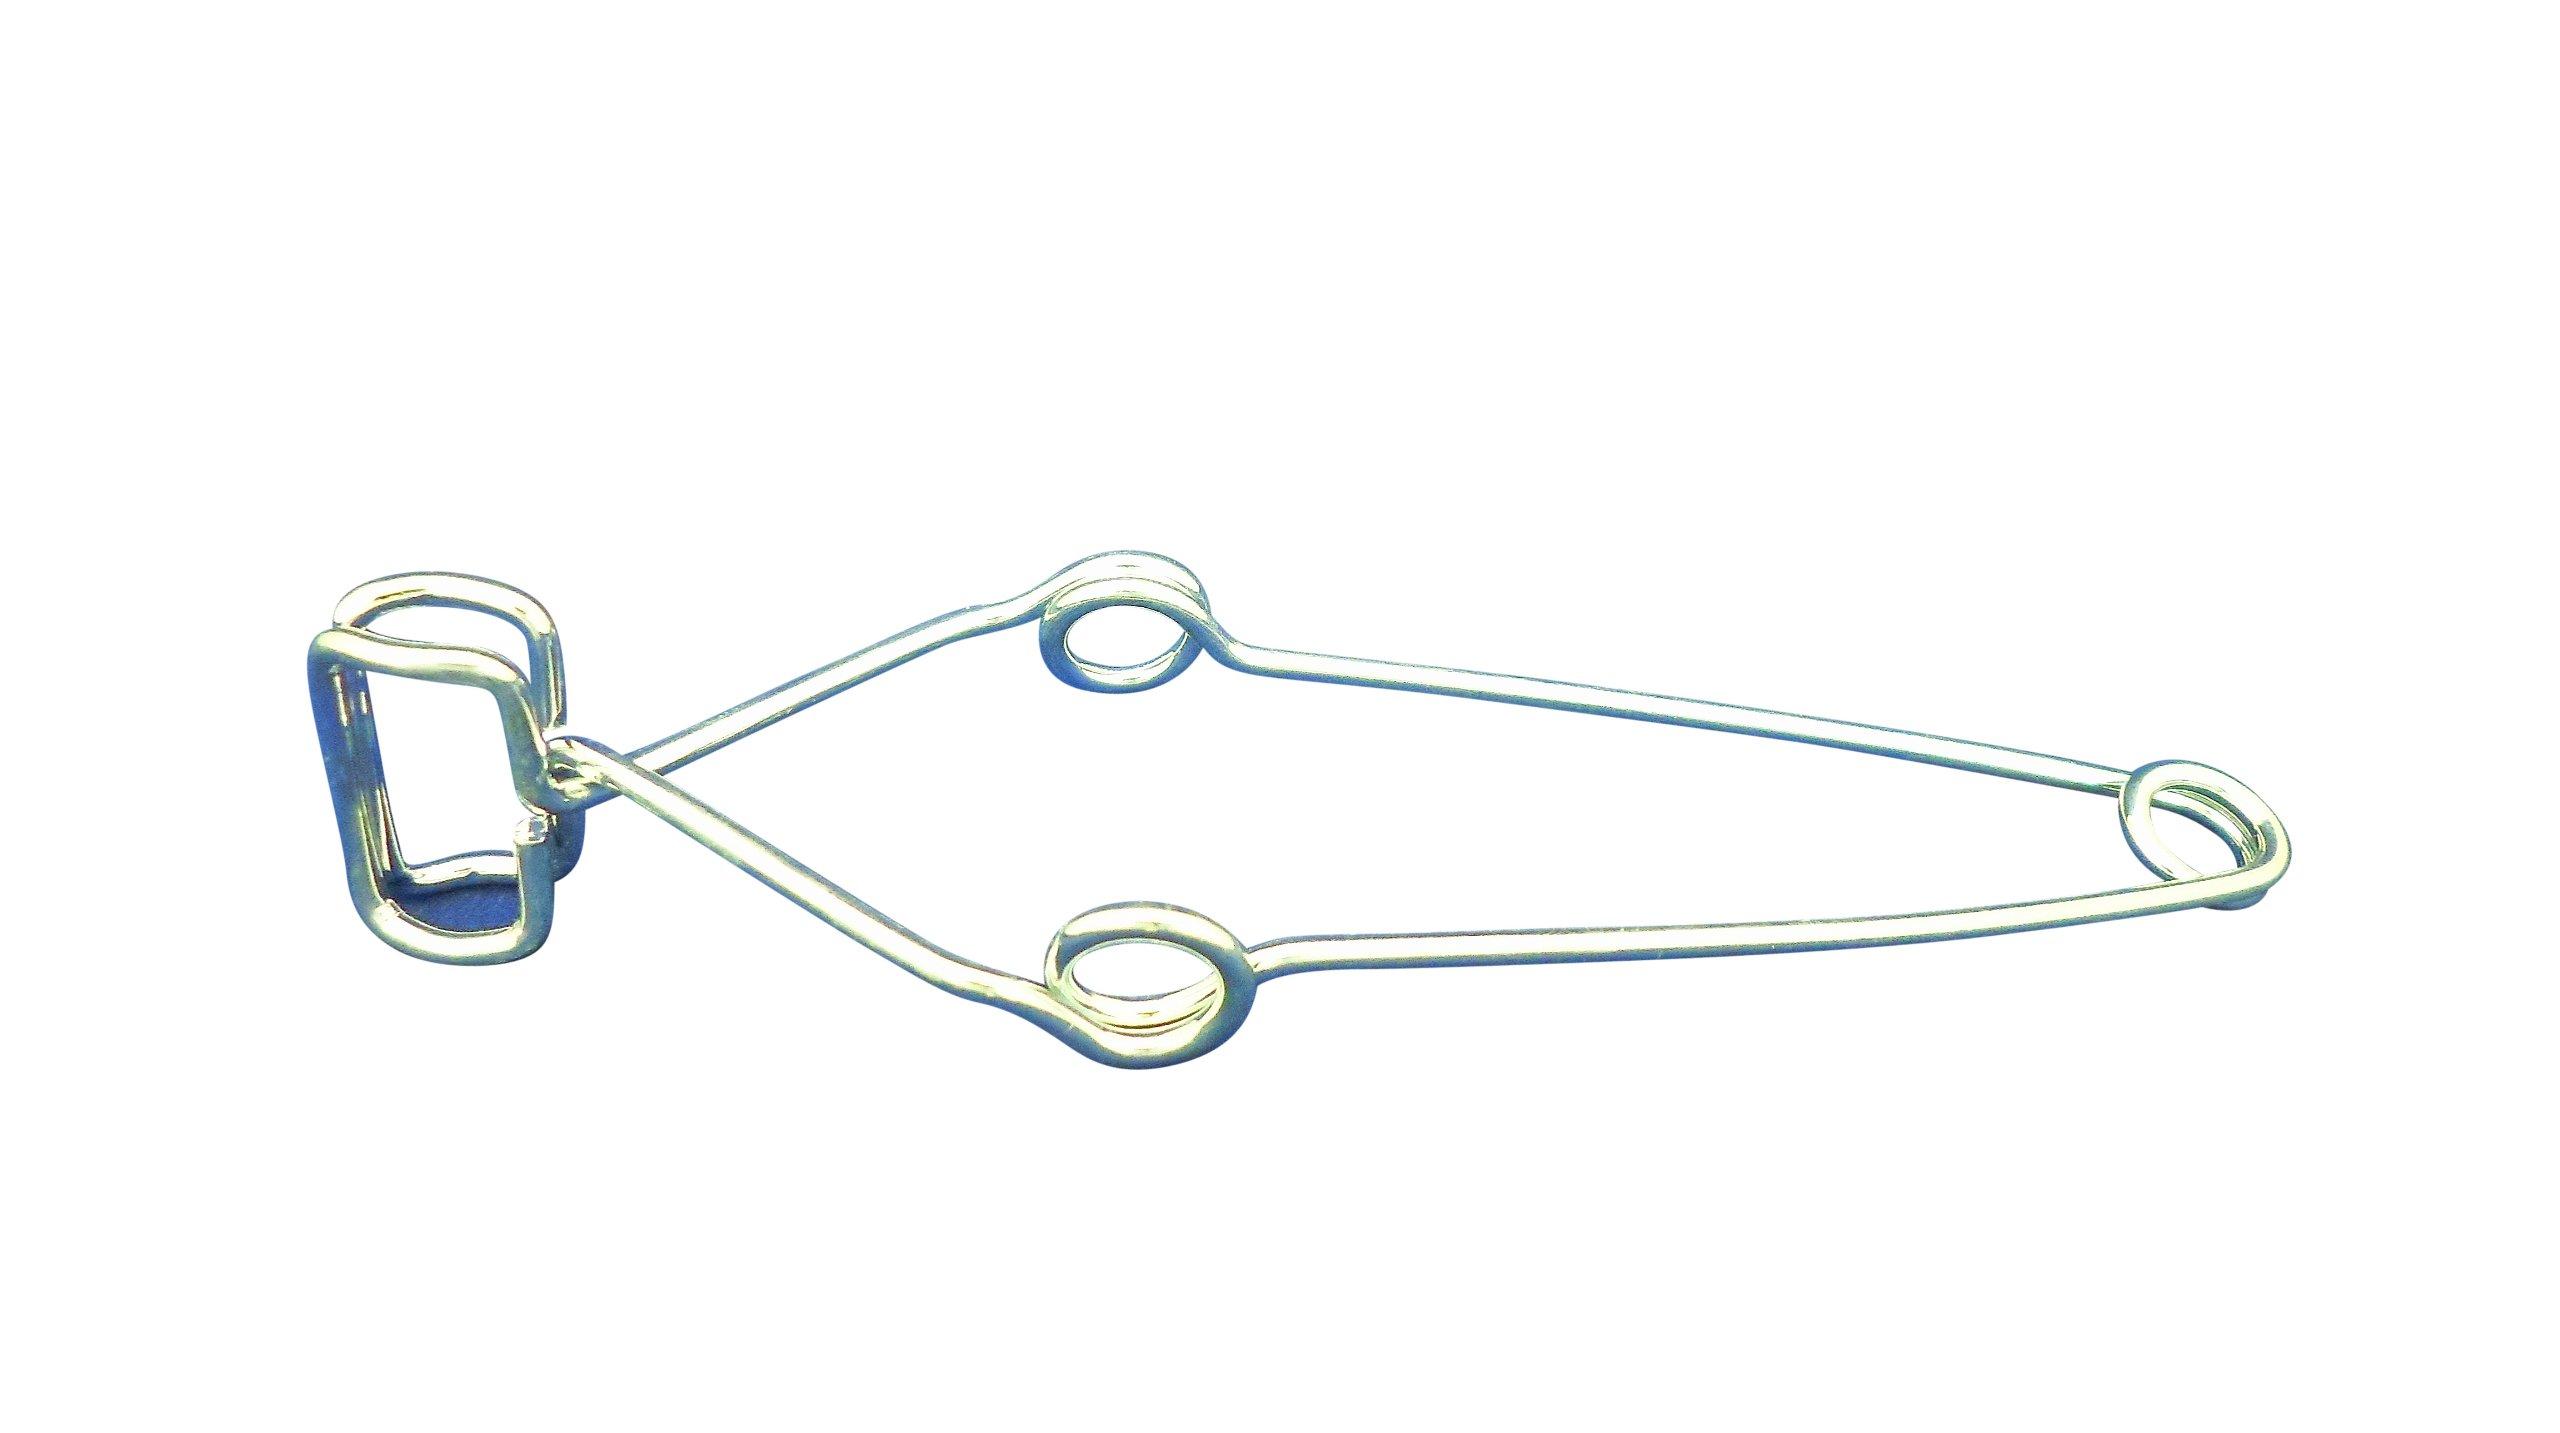 Ajax Scientific Spring Steel Test Tube Clamp, 16cm Length